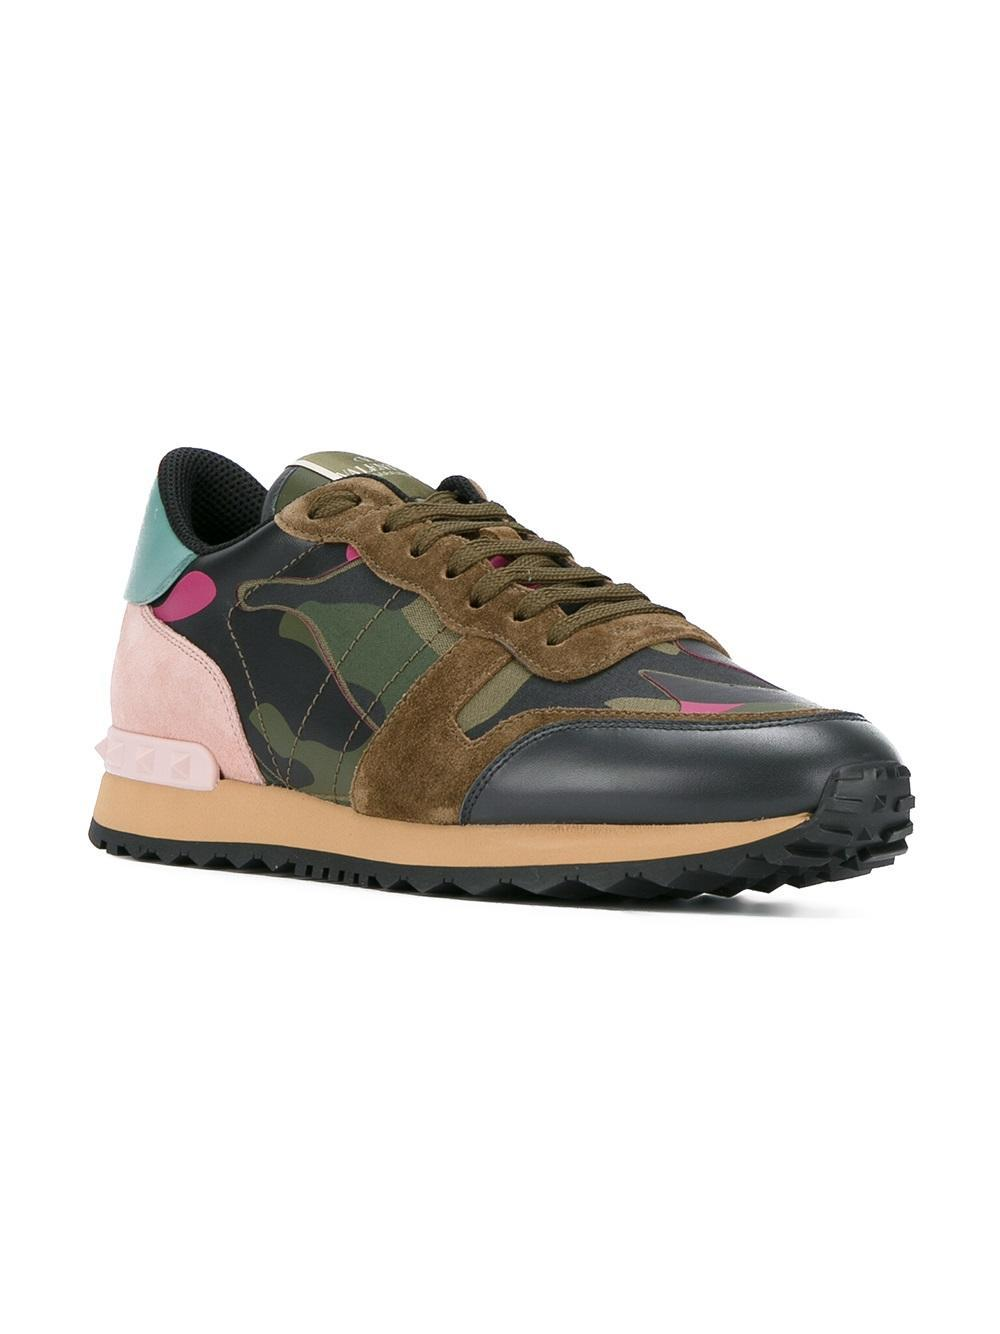 Lyst - Valentino Garavani Rockrunner Sneakers